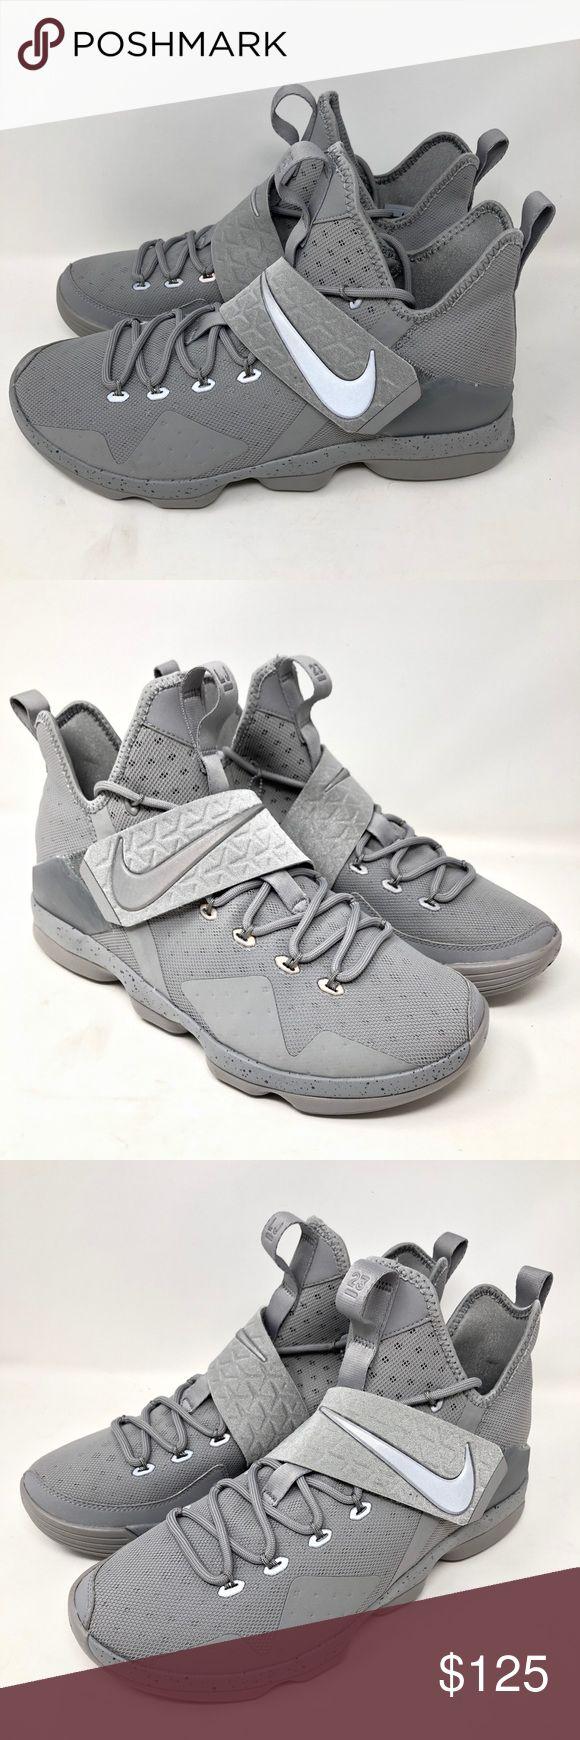 Nike Lebron 14 King James Reflective 852405-007 Nike  Lebron XIV 14  Men's Sz 11.5  King James  Silver  Reflective  852405-007 New, no box Nike Shoes Sneakers